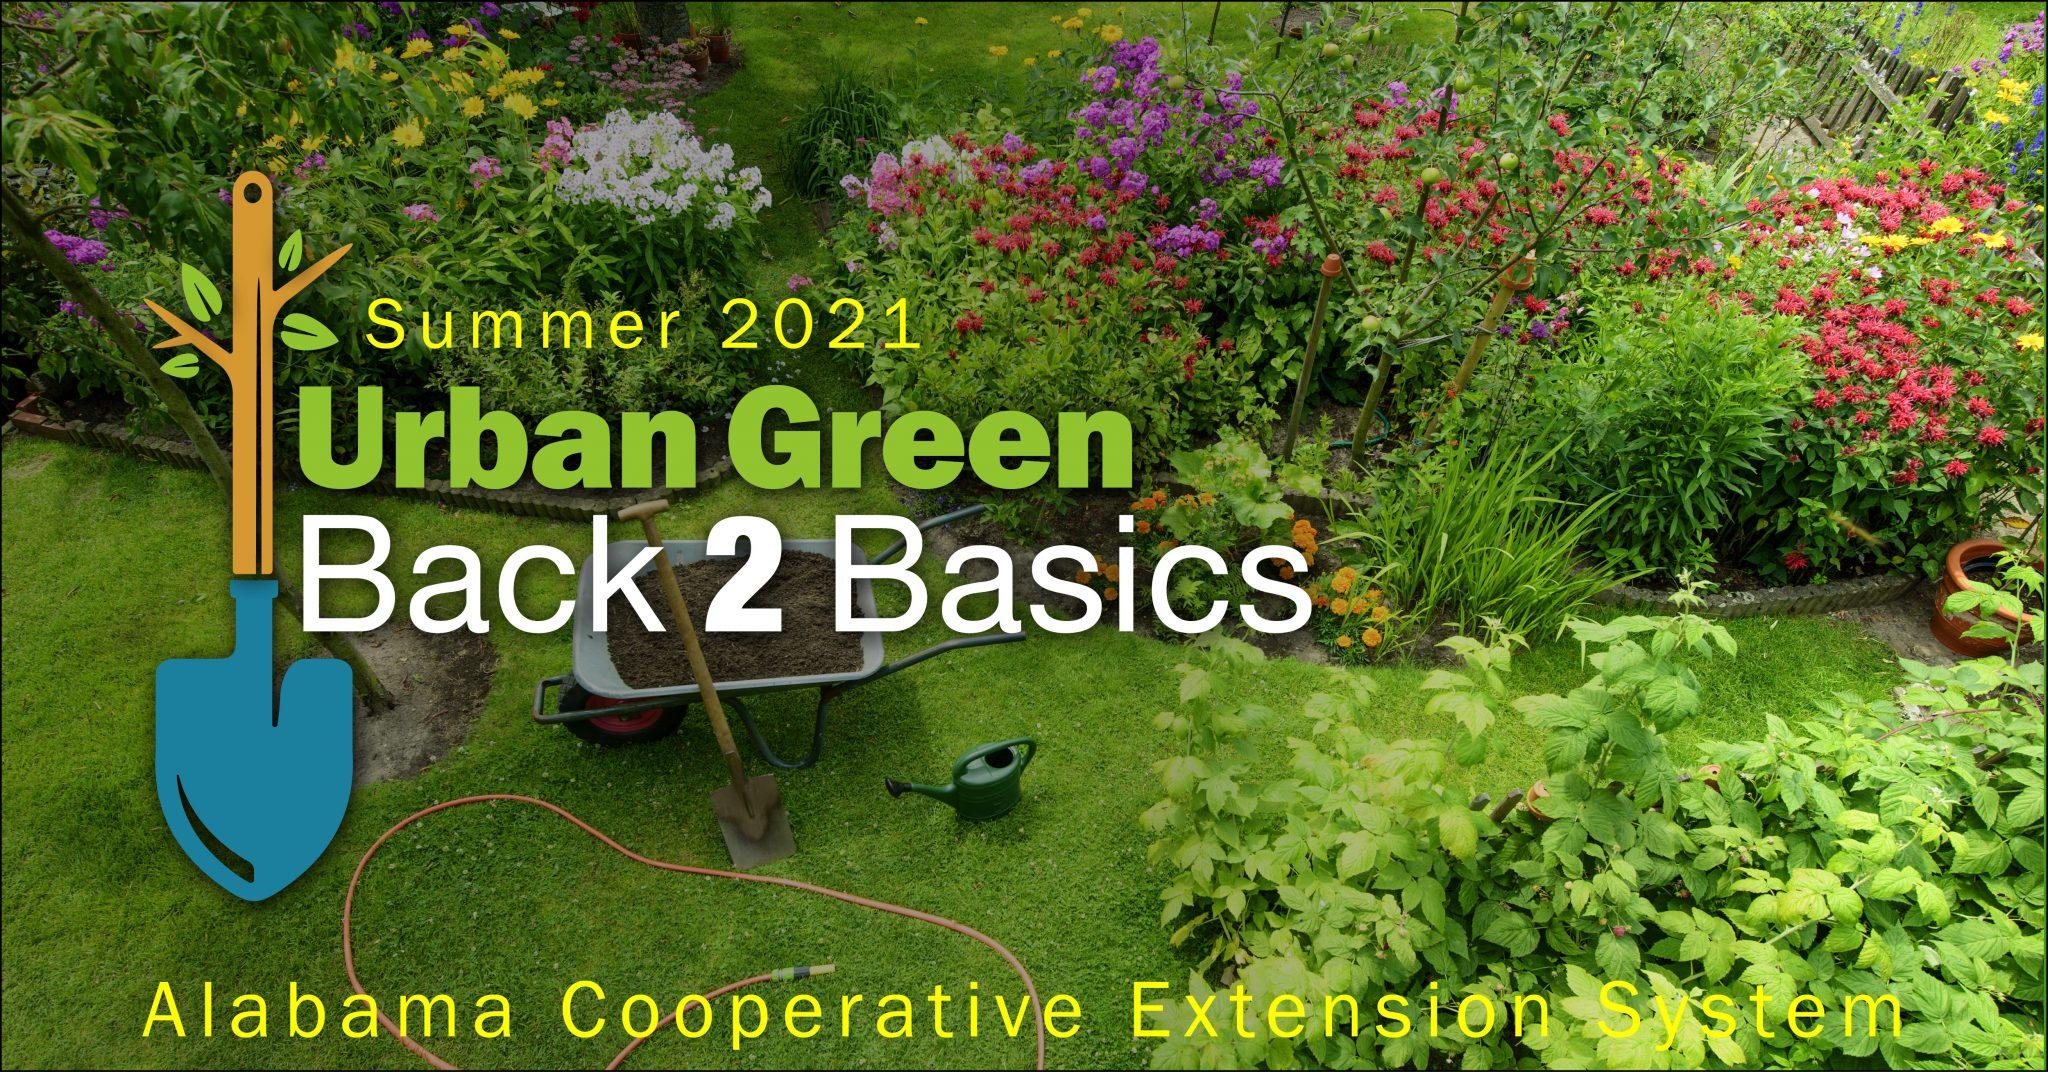 Summer 2021 Urban Green Back 2 Basics